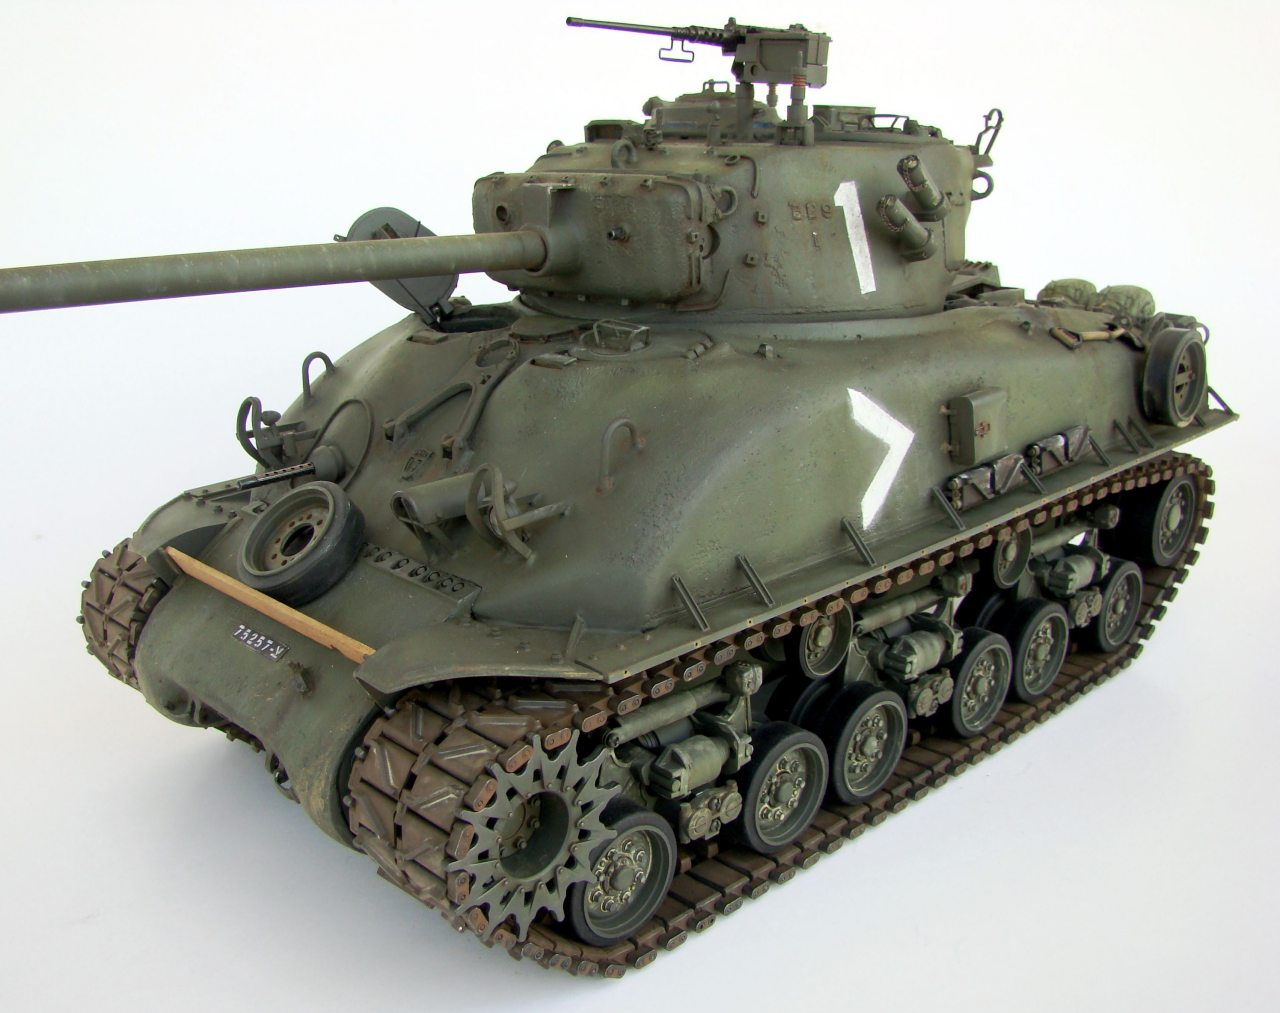 M4 Sherman IDF Service 1:16 scale -Tamiya - RC tank